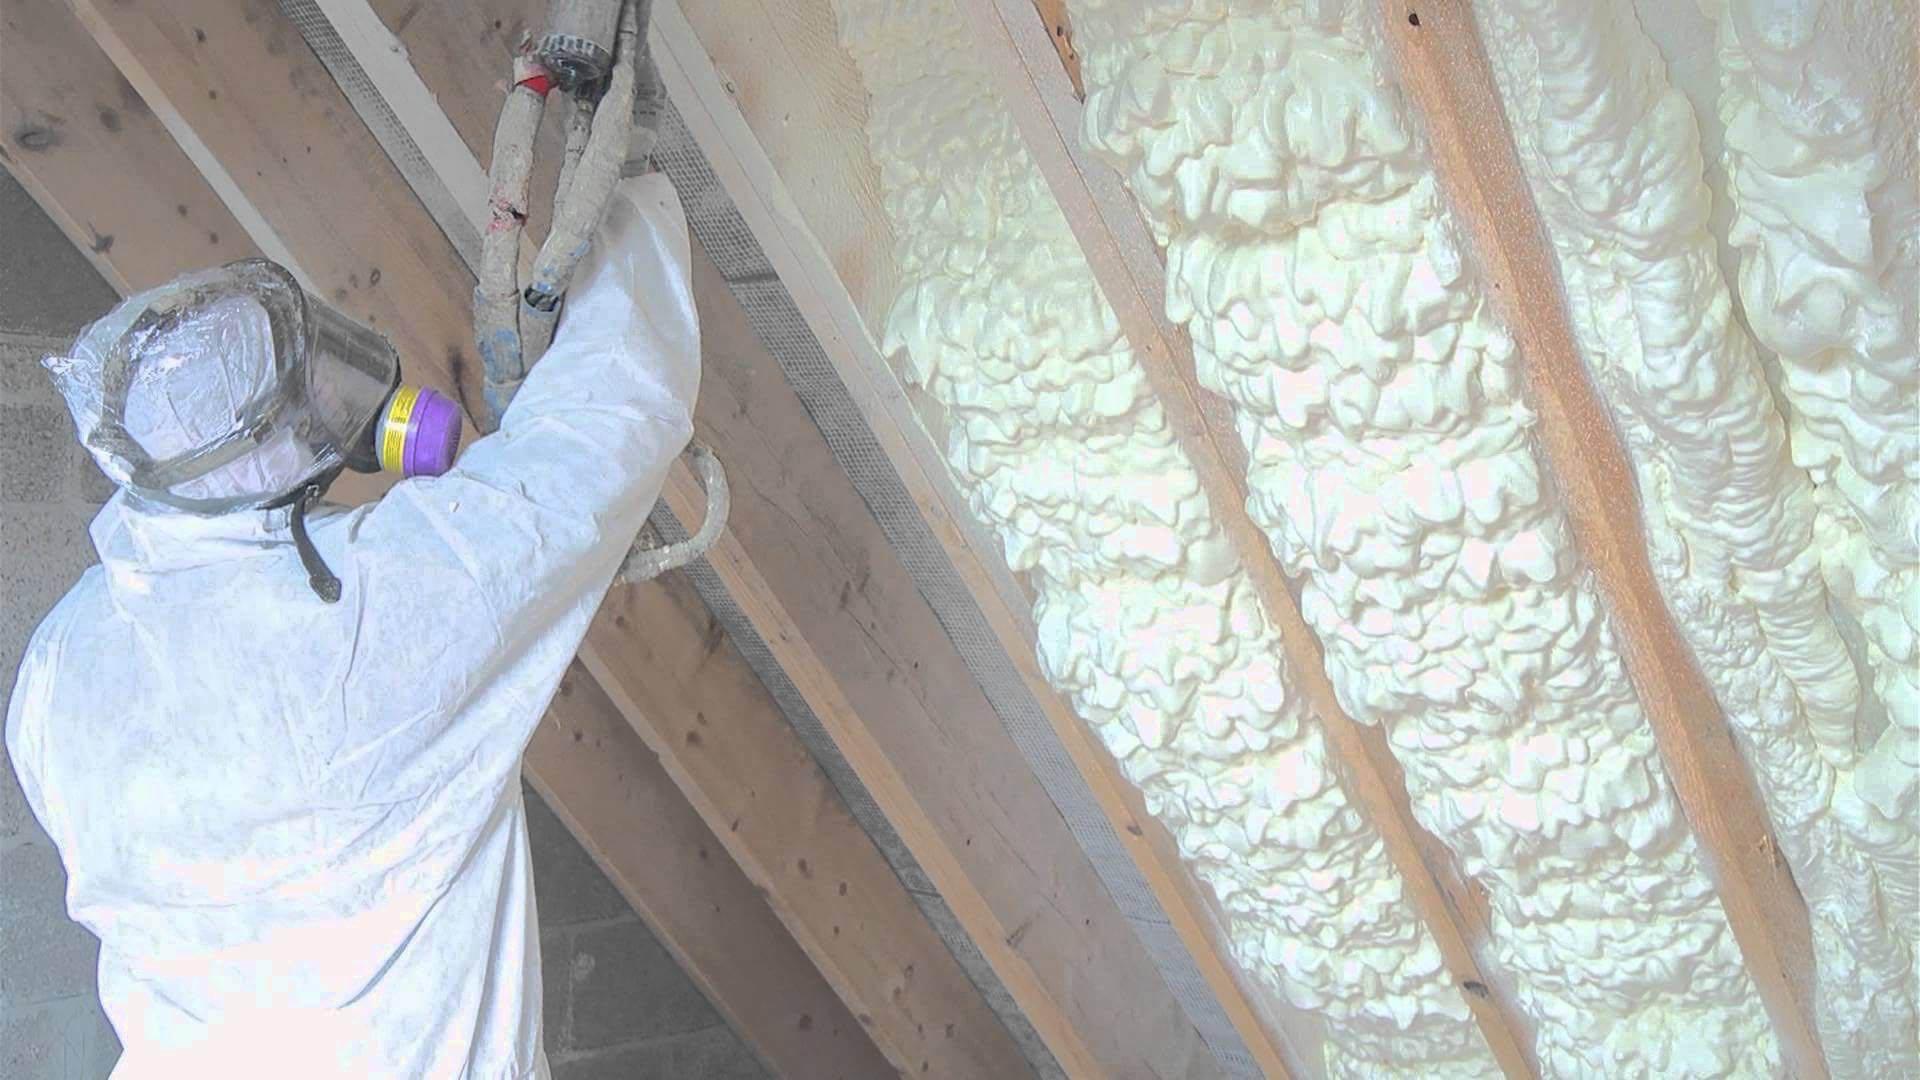 Icynene Sales Spray Foam Insulation From Carrington